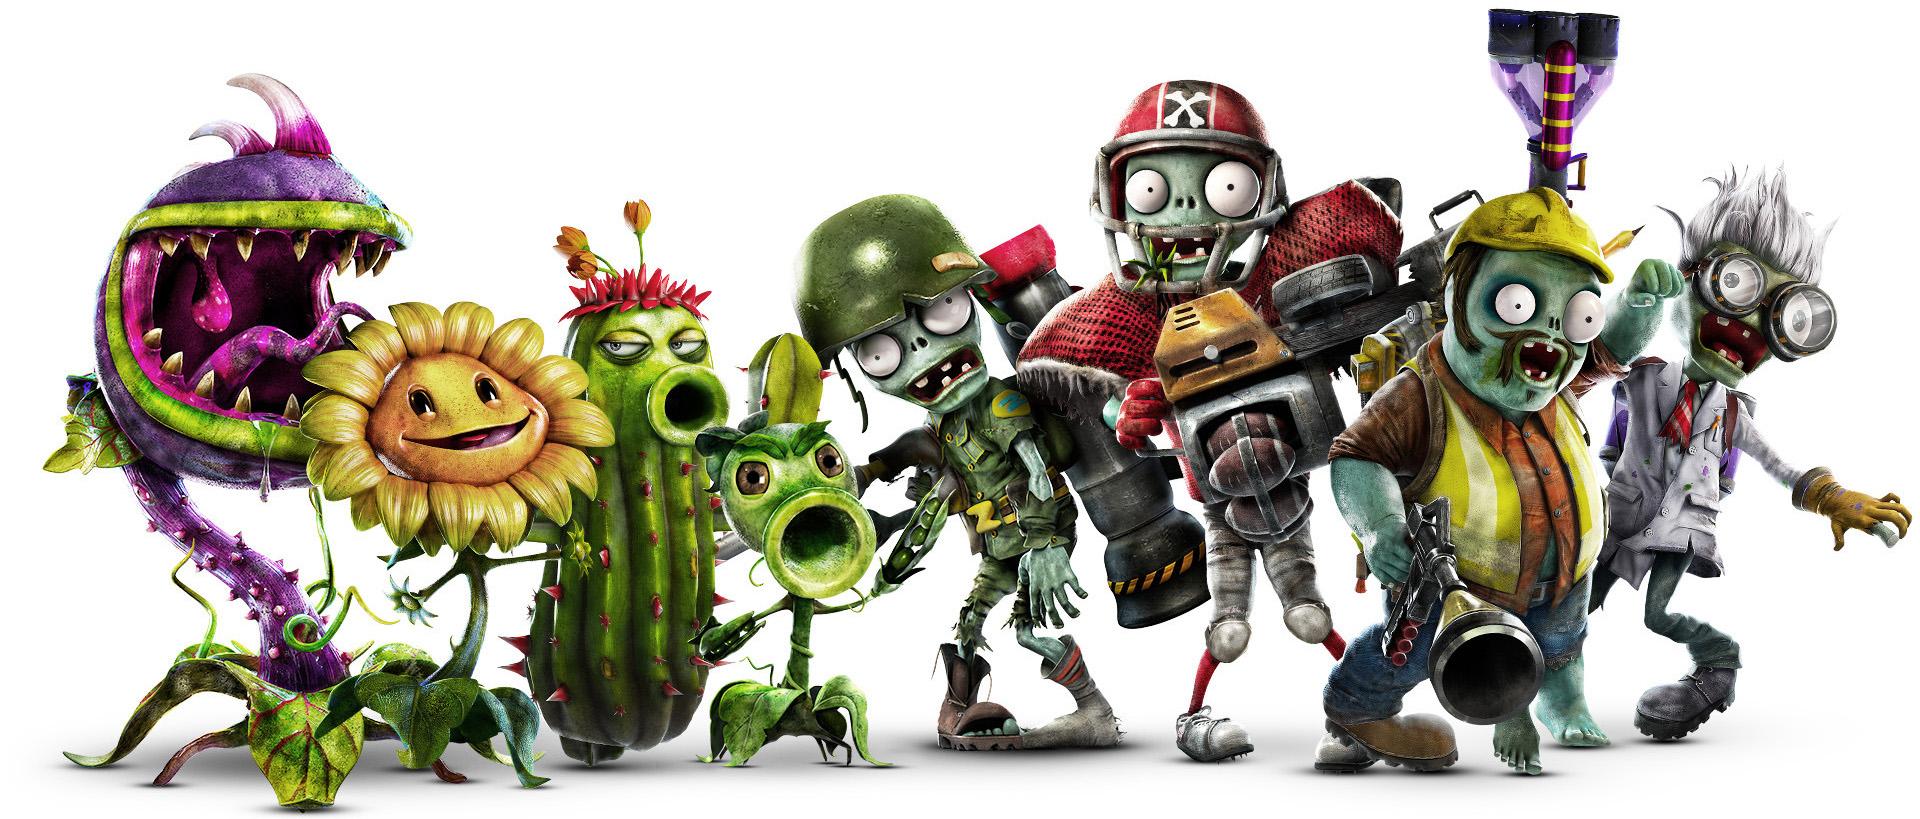 Plants vs Zombies Garden Warfare 2 - VGPRofessional (15)